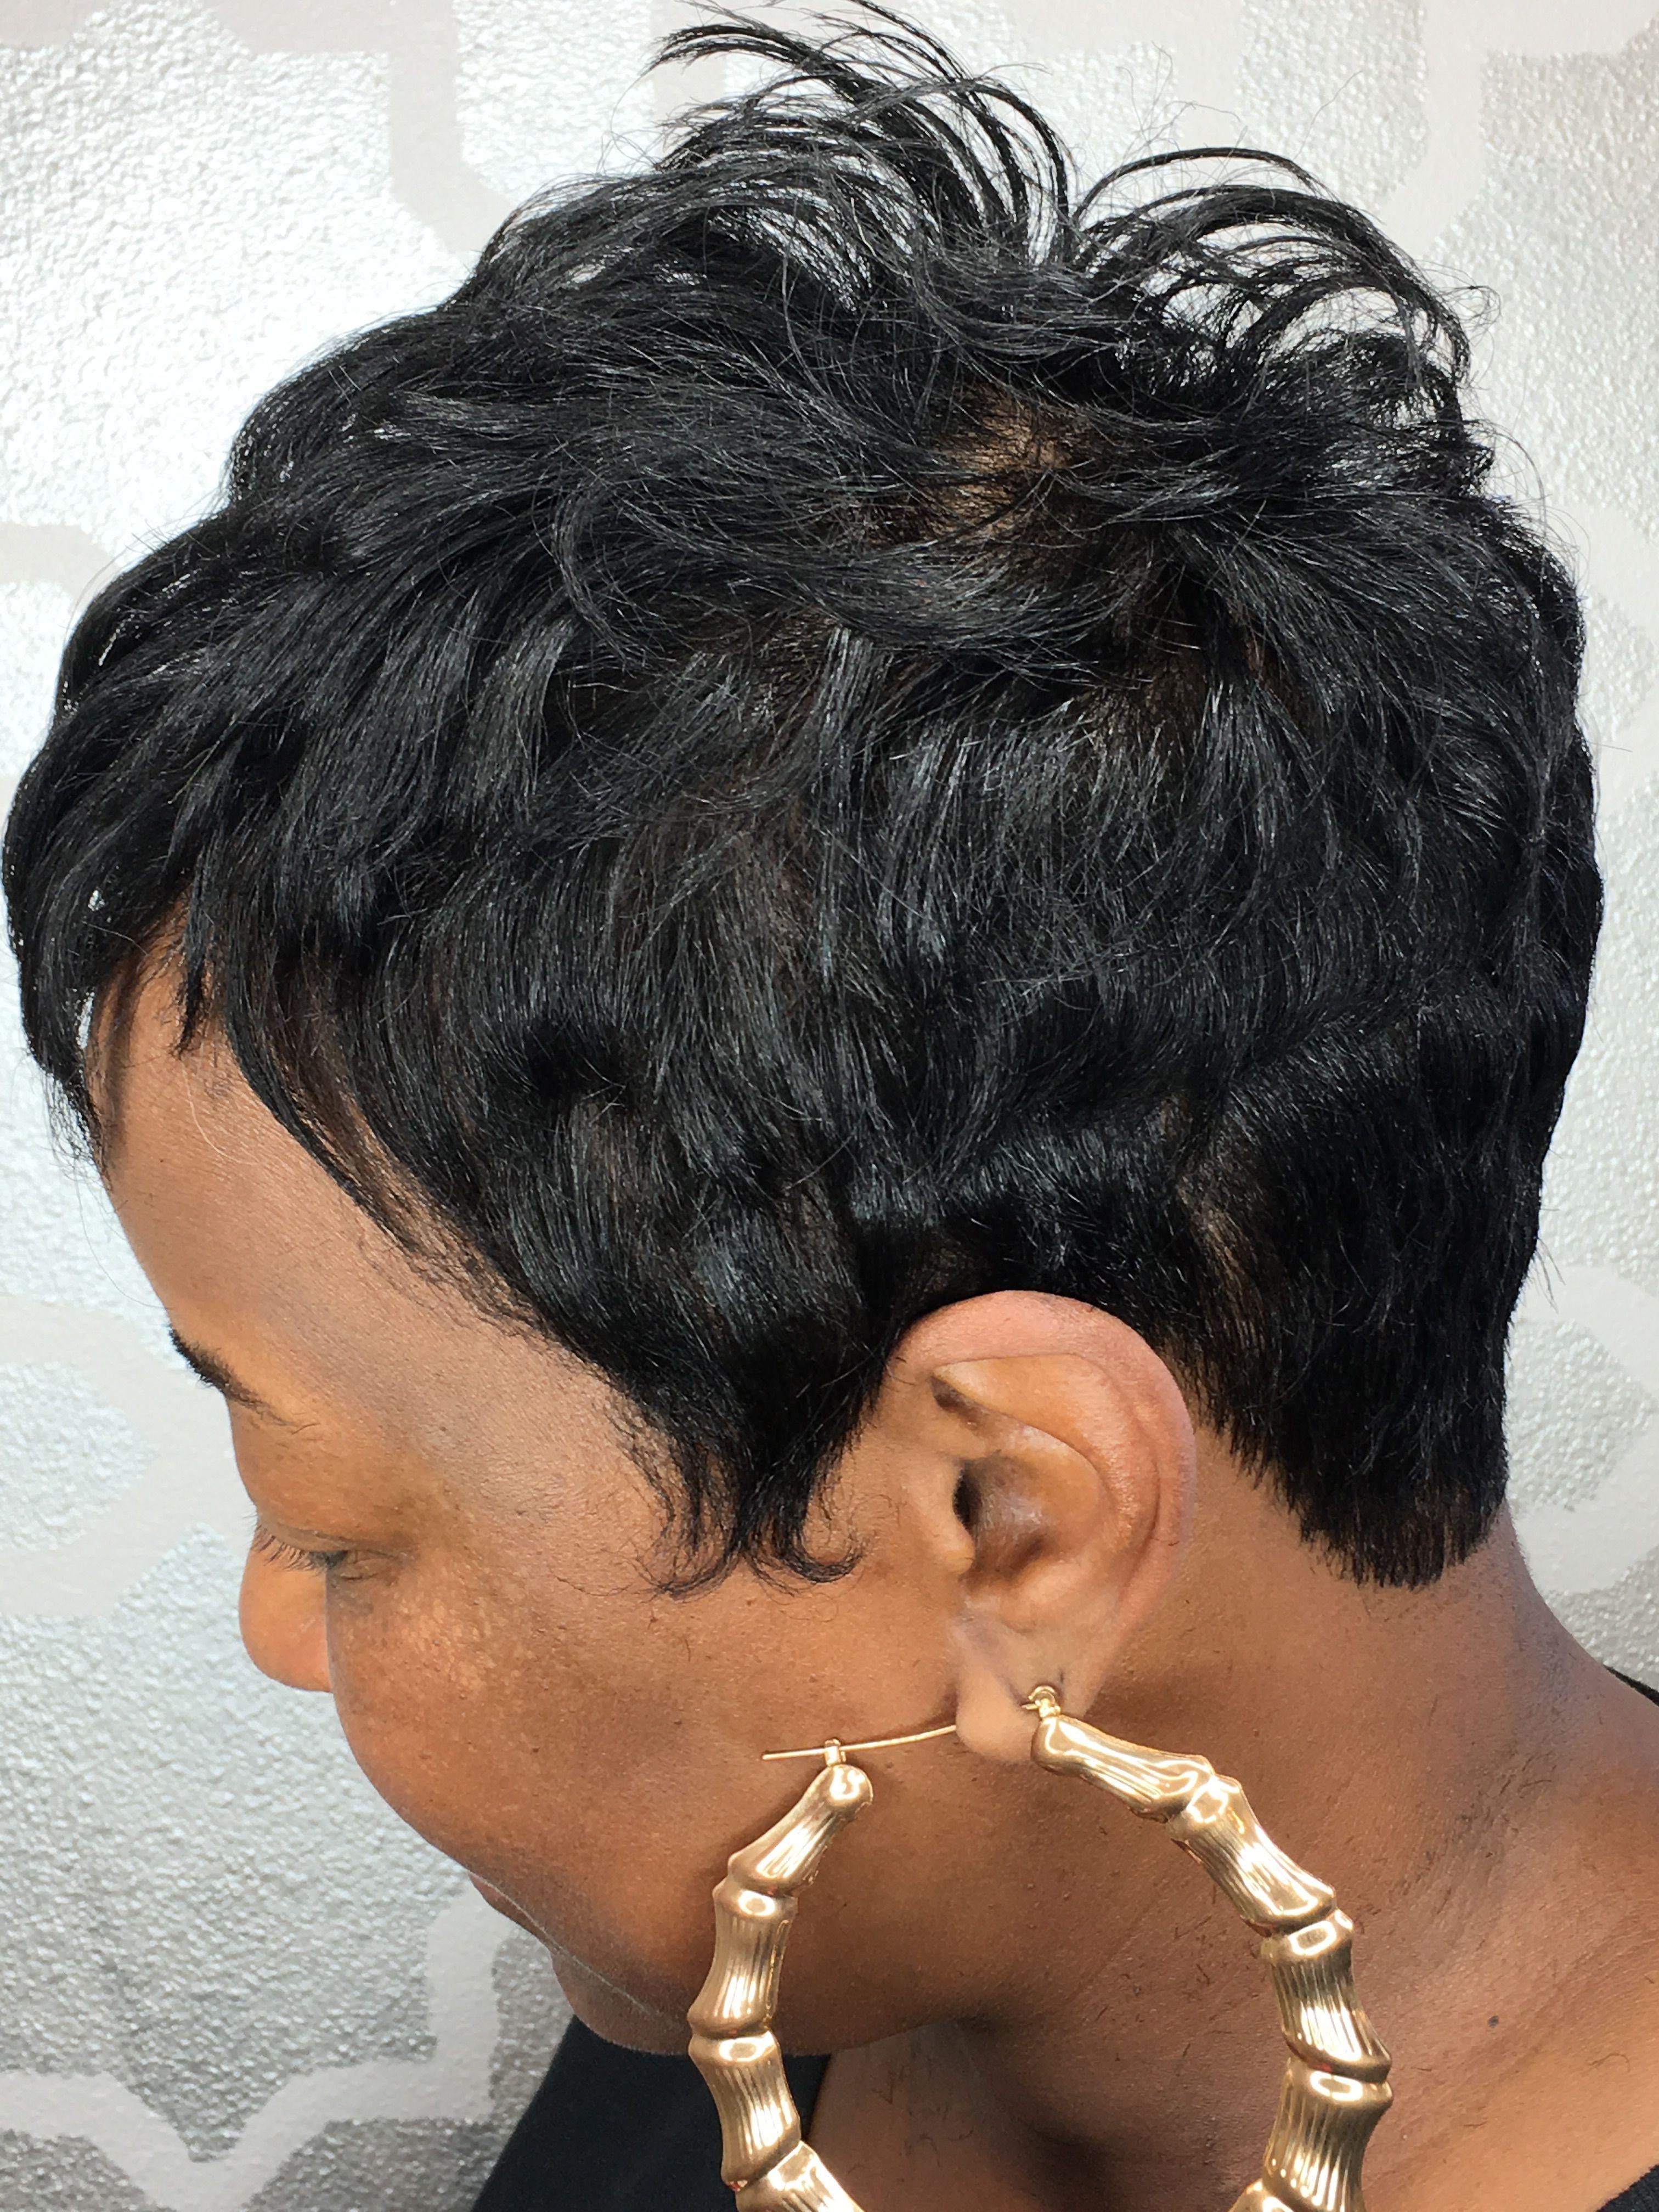 Pin by charhugs on fresh cuts pinterest short hair short